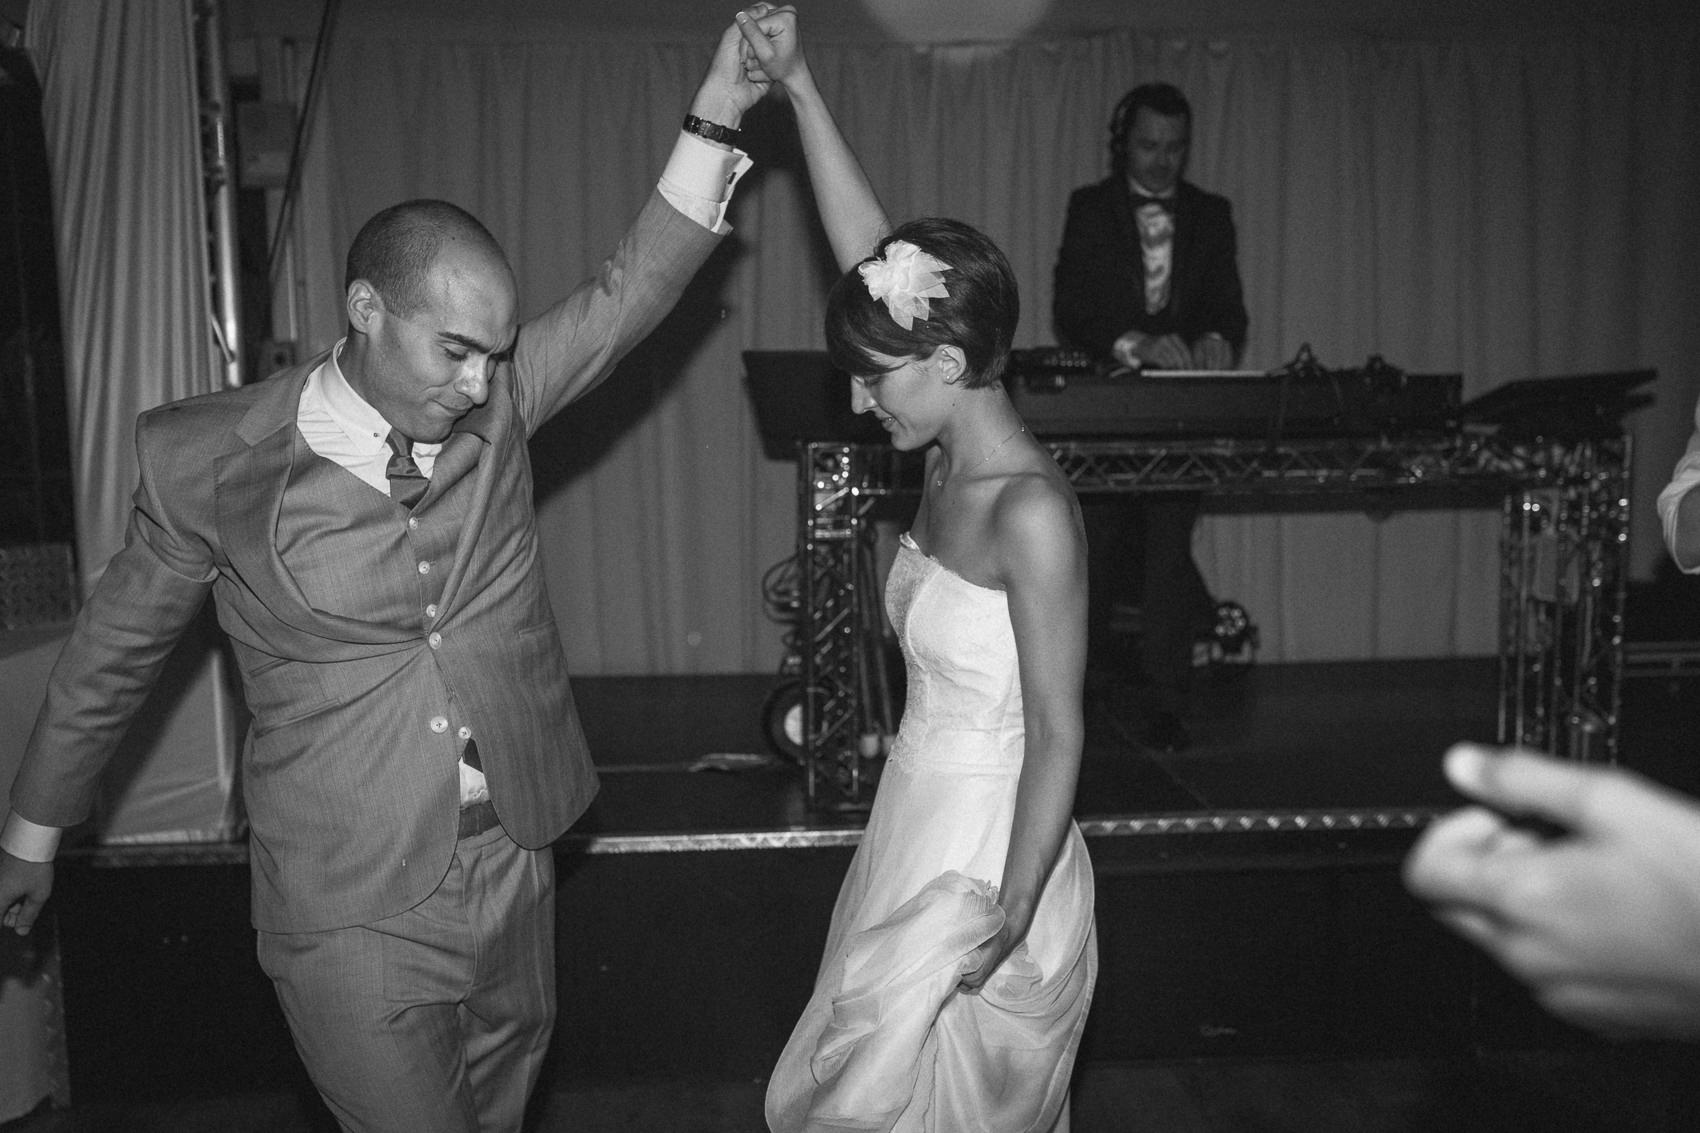 mariage-charlotte-et-joel-trendzphotography-122